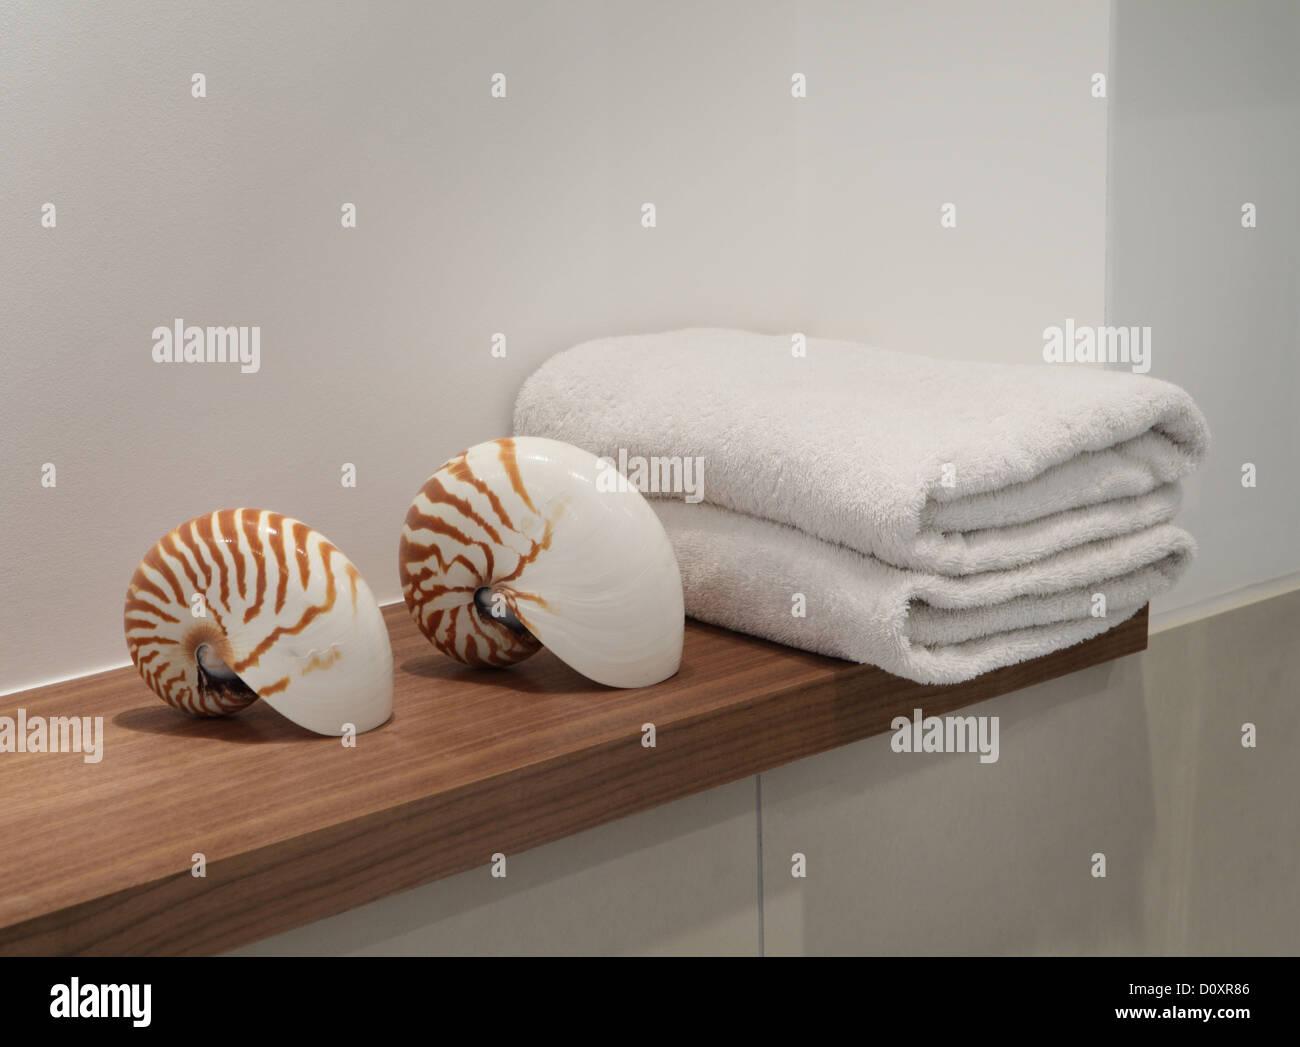 Seashells and towels on shelf - Stock Image